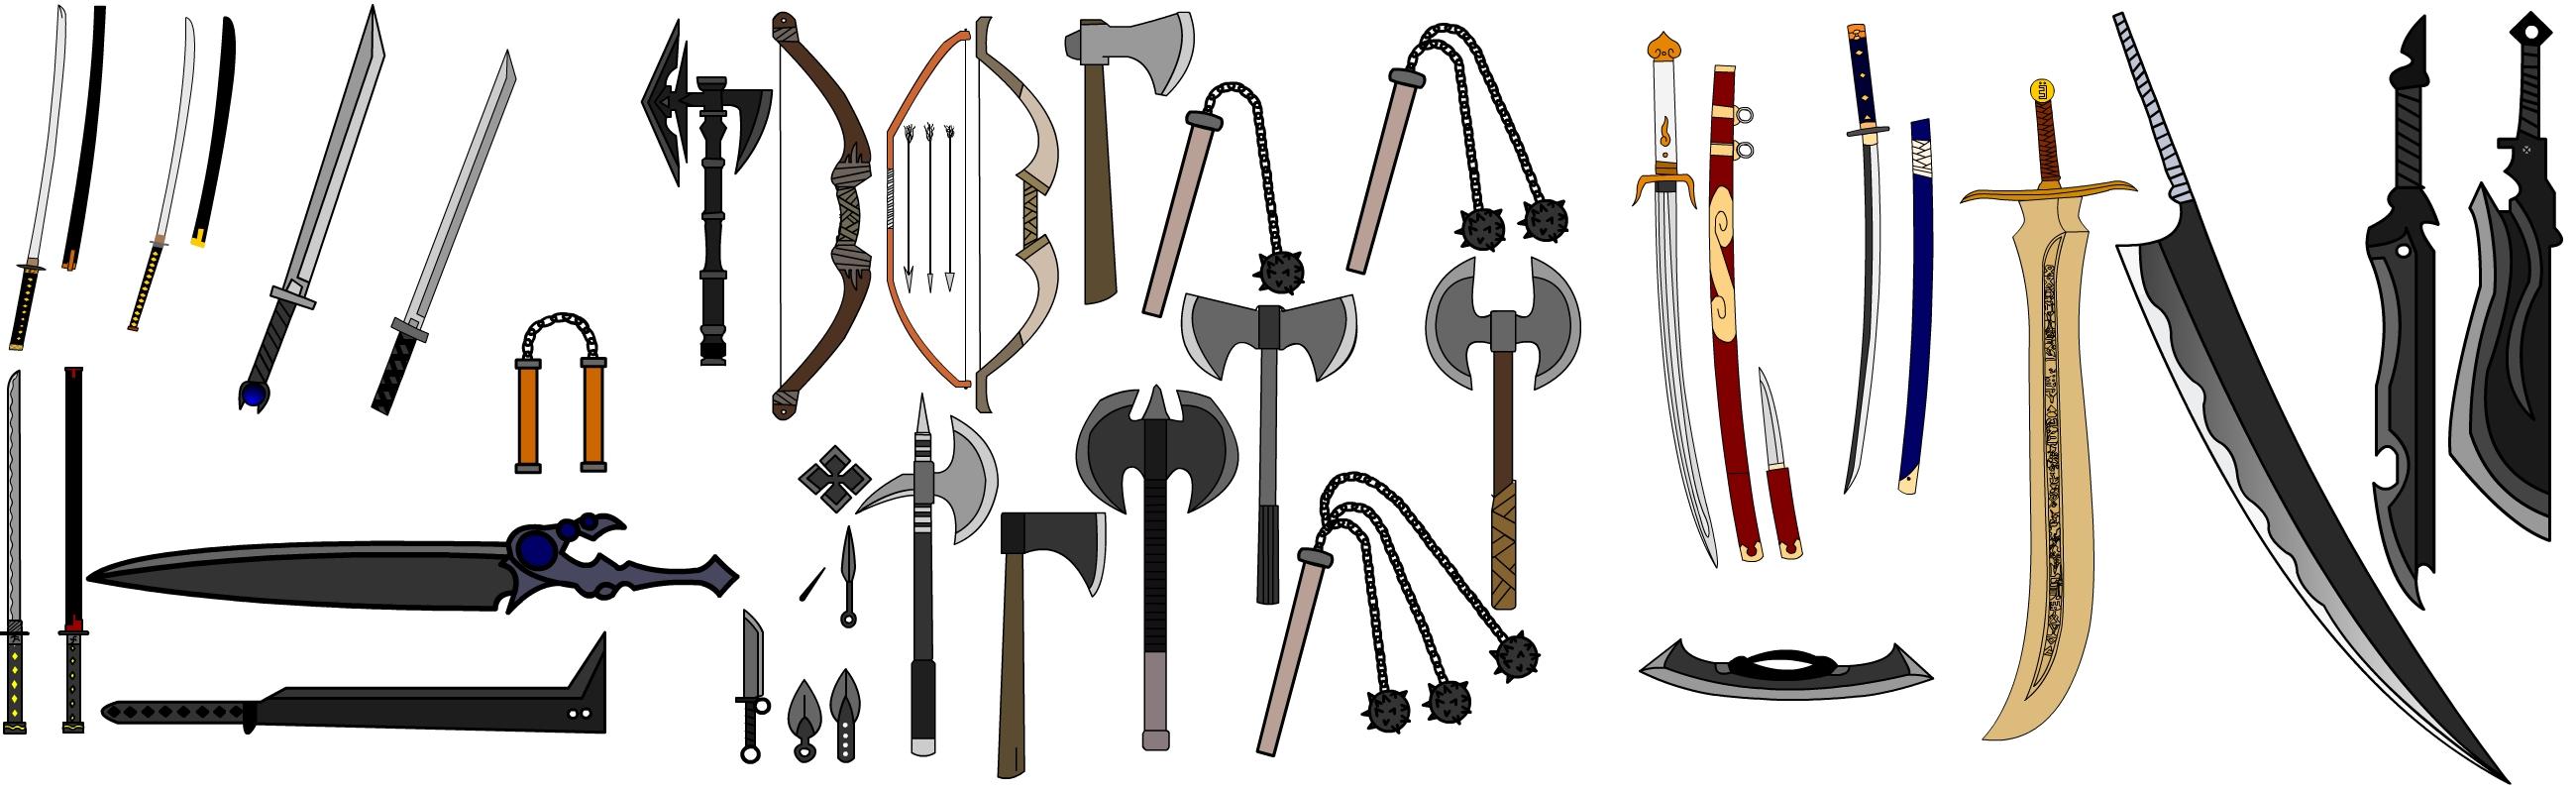 Melee Weapons by ninja-steave on DeviantArt